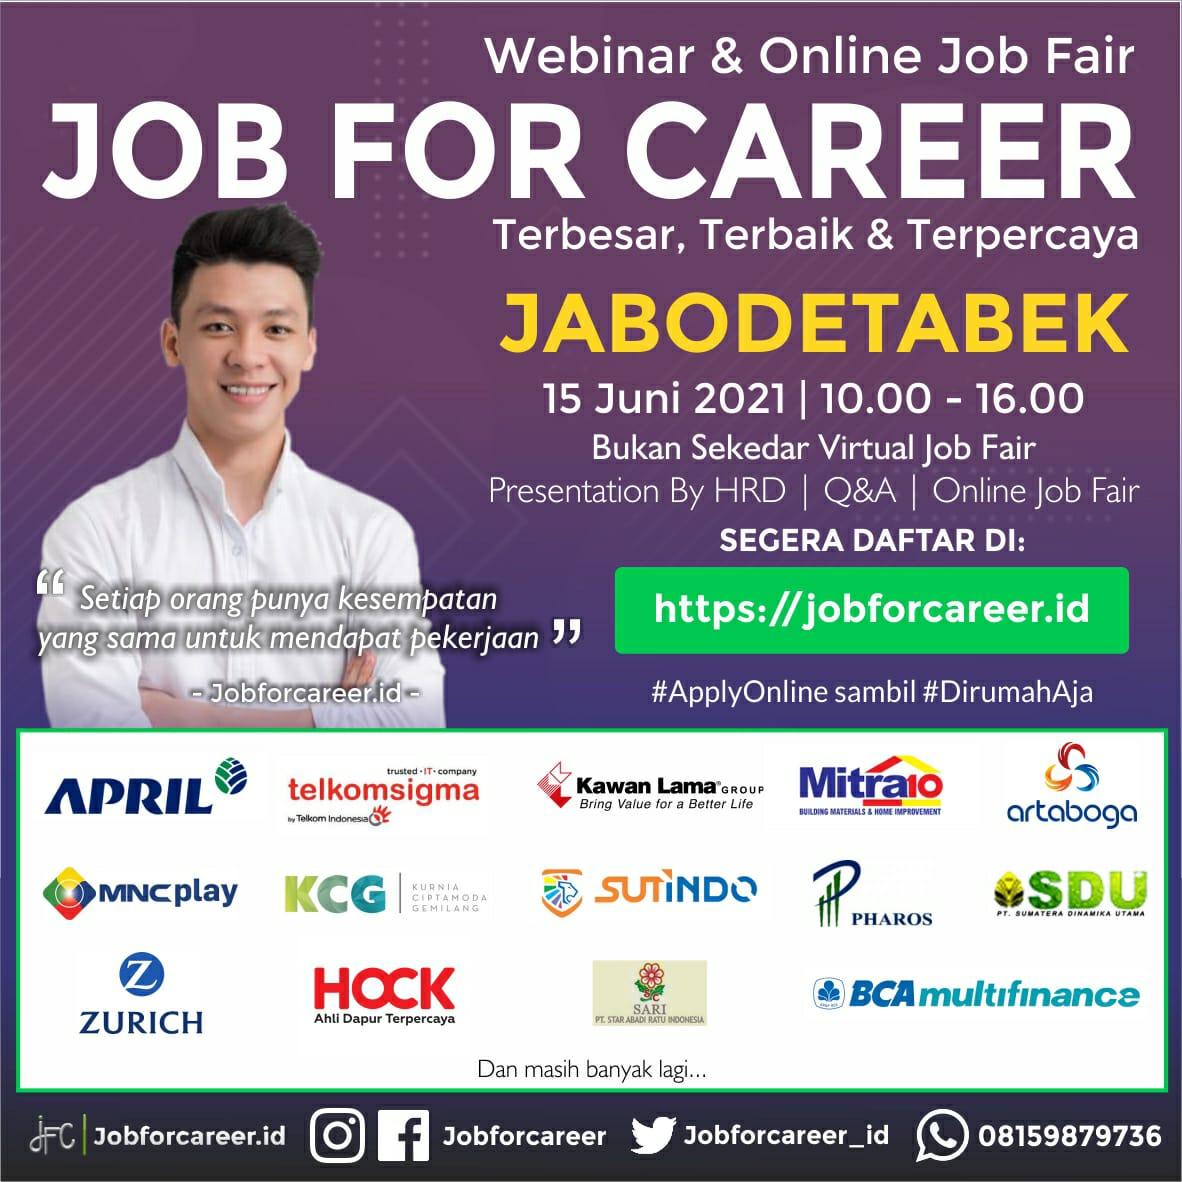 JOB FOR CAREER